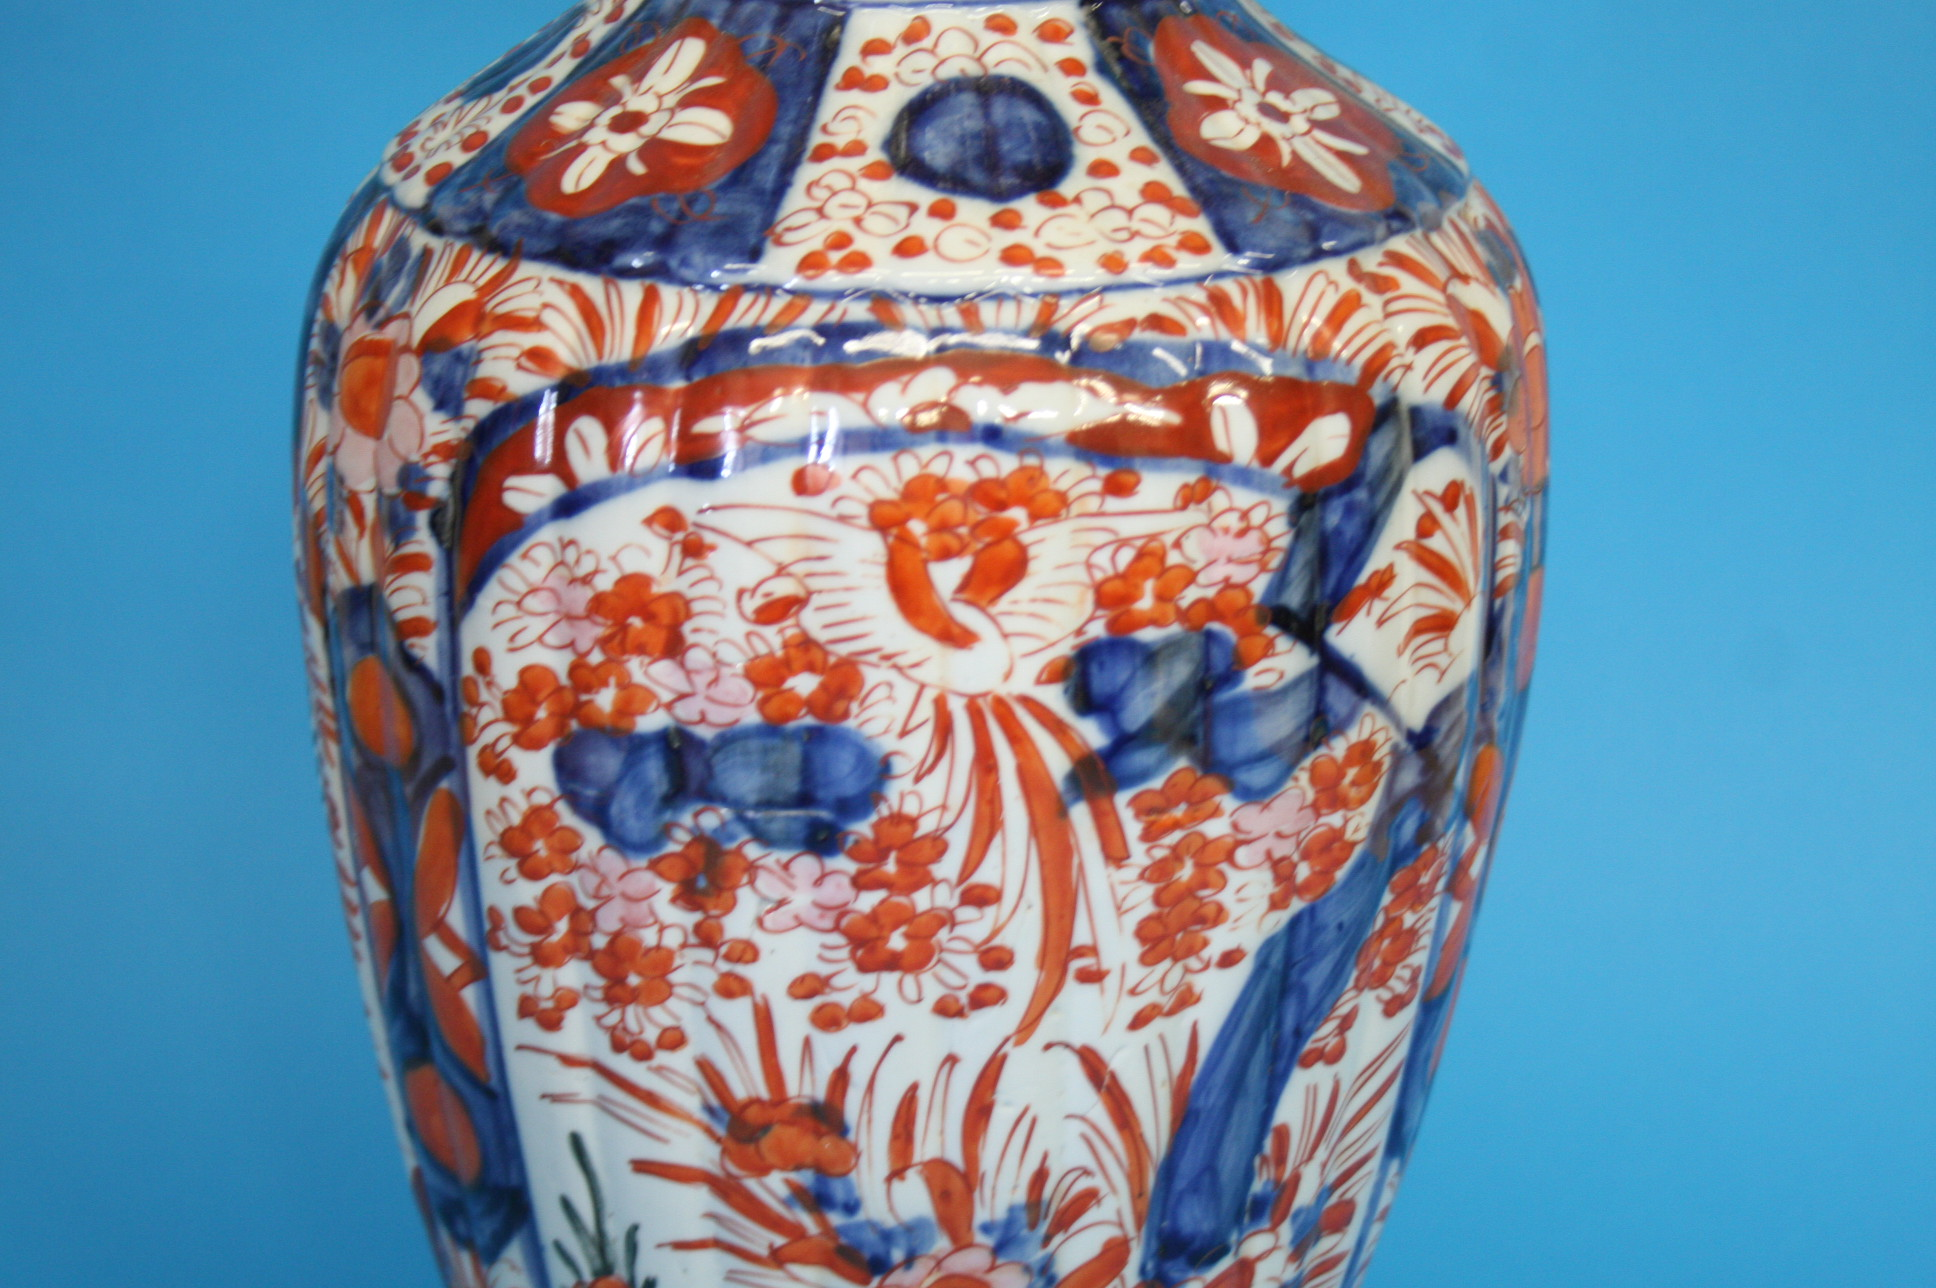 A Japanese Imari vase, with waisted neck, 46cm hei - Image 2 of 2